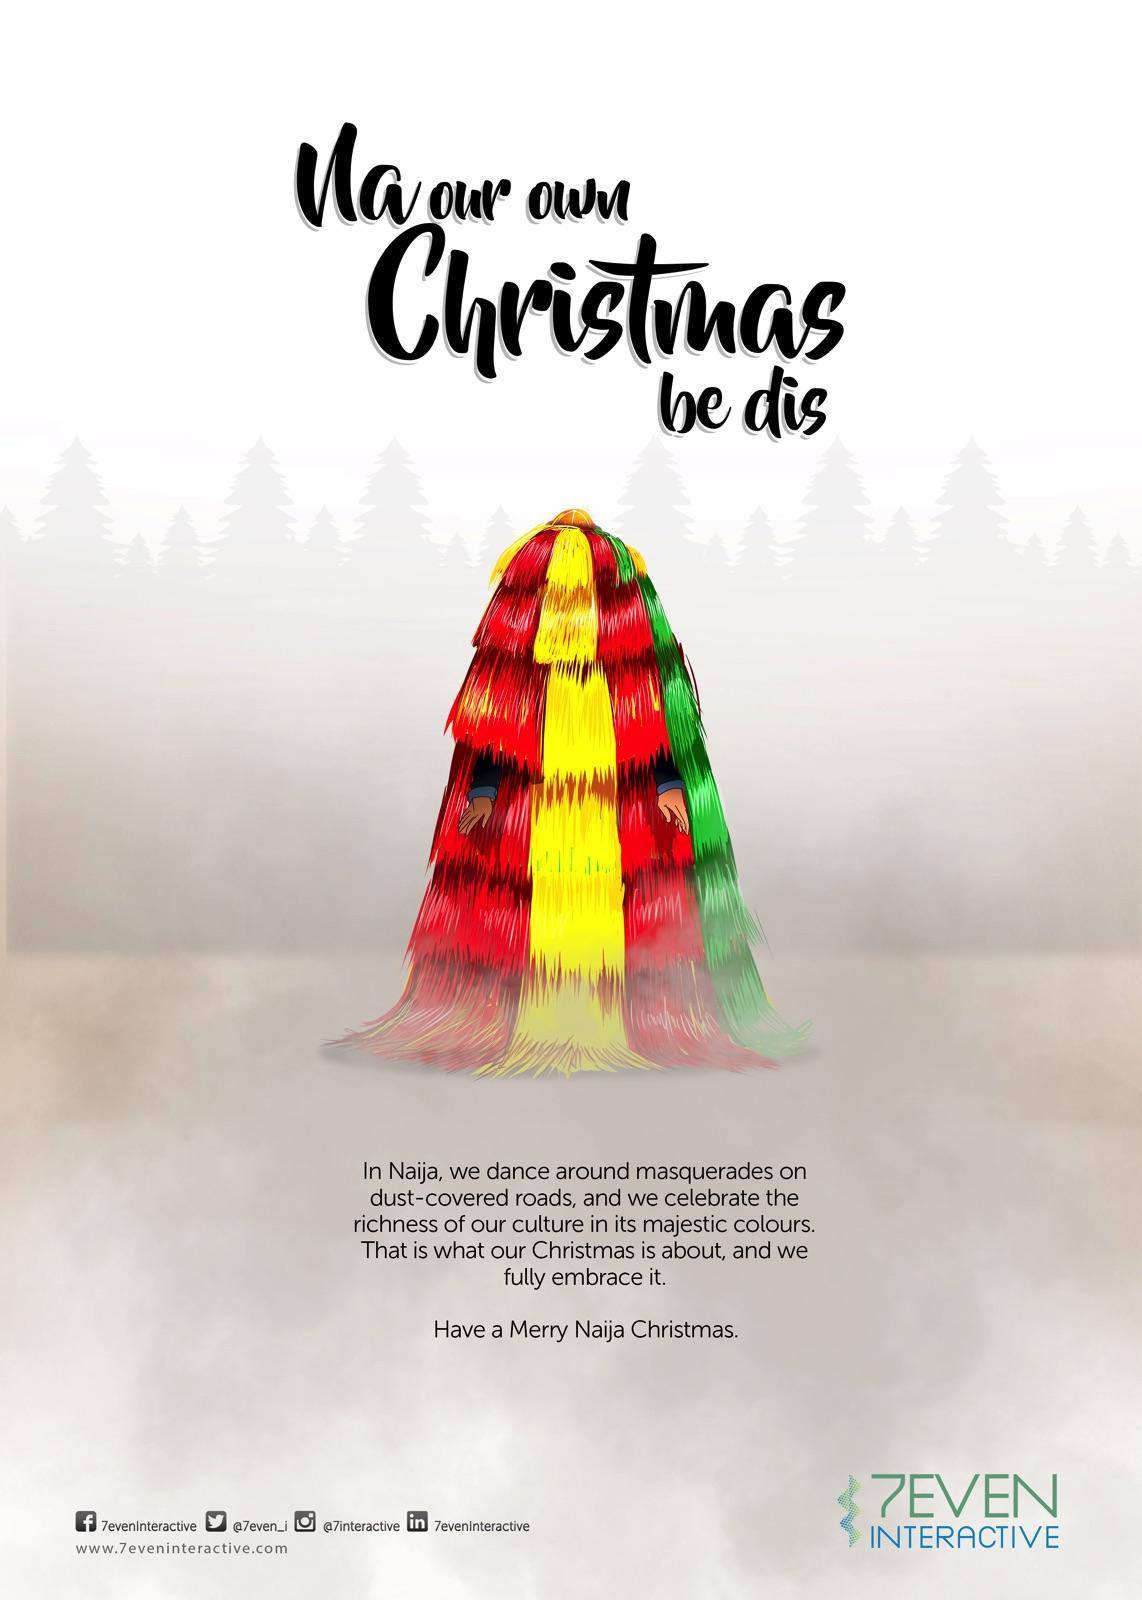 43.Merry Christmas 2C Thumb.[大嘴收纳屋].Jpg